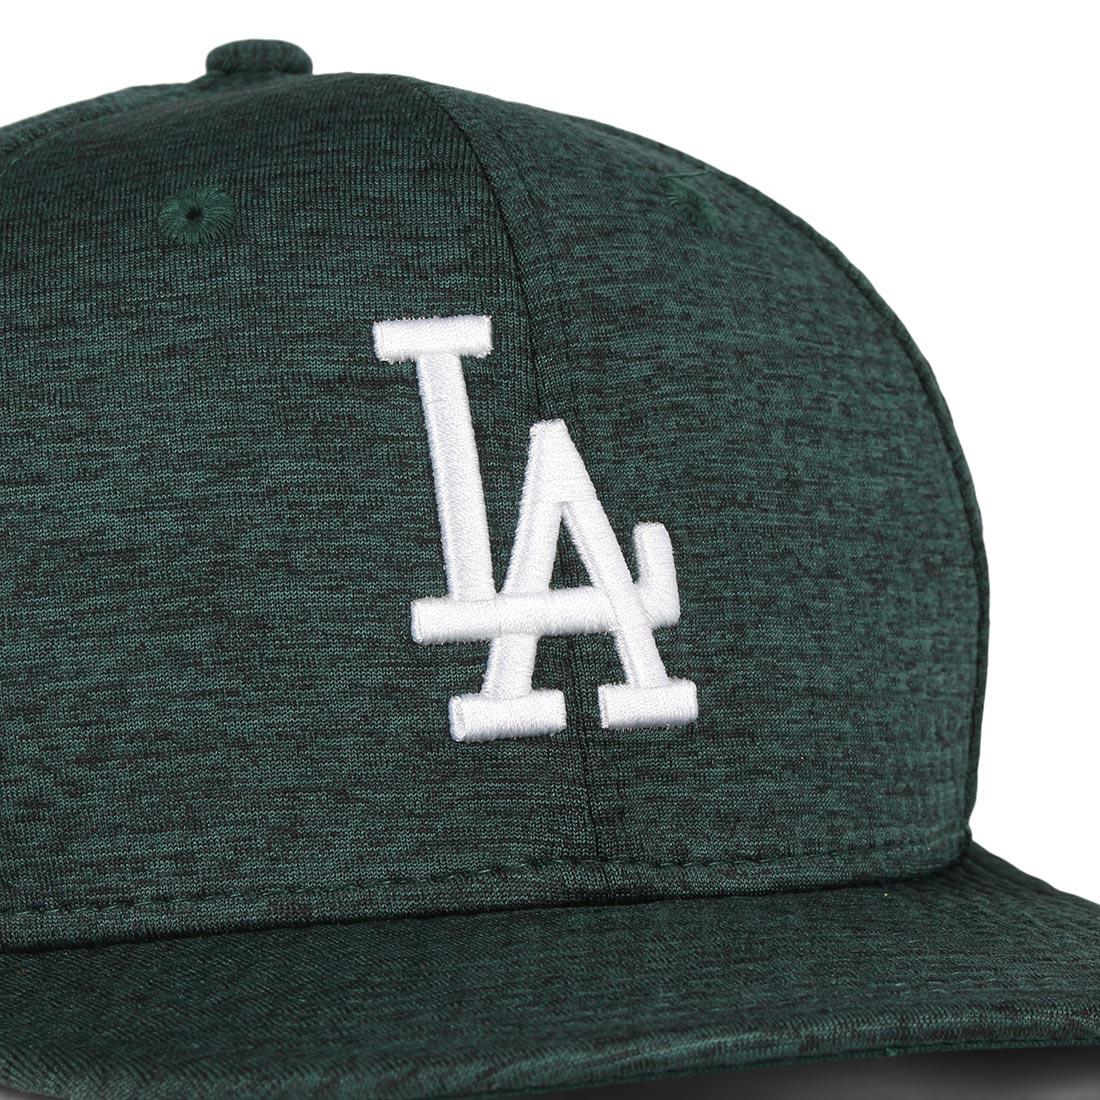 New Era LA Dodgers DrySwitch 9Fifty Cap - Dark Green / Optic White